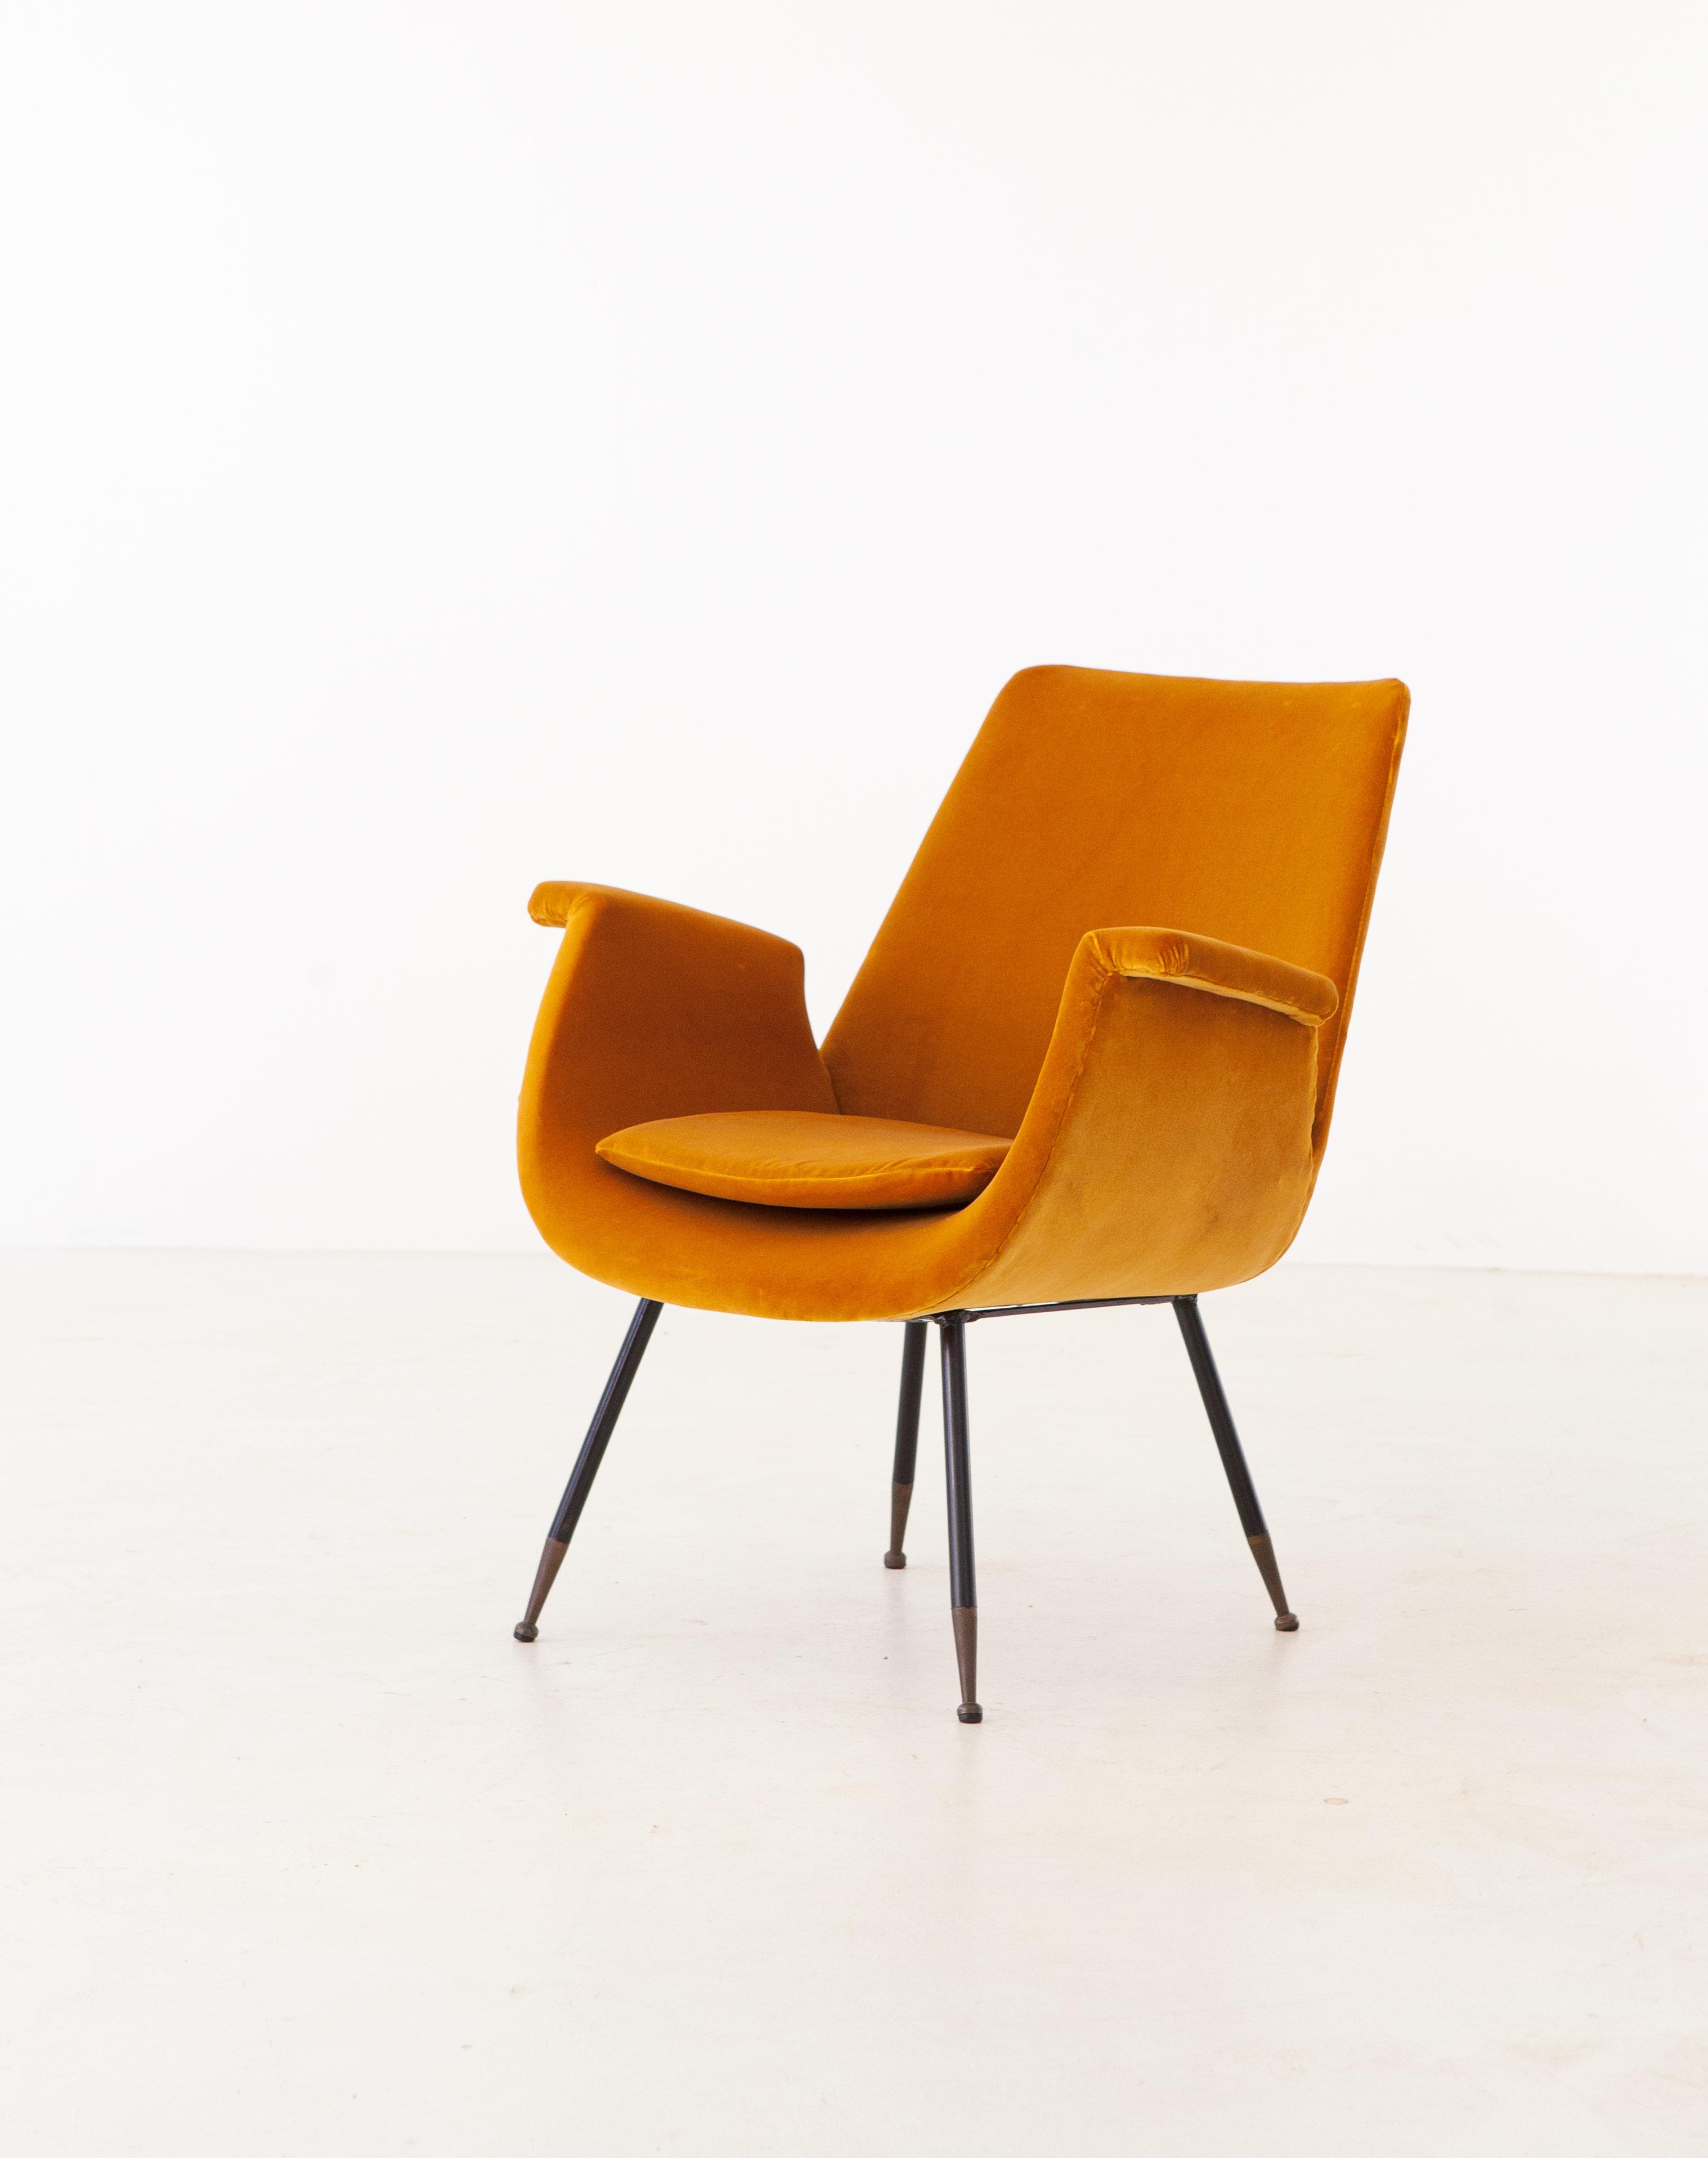 1950s-gastone-rinaldi-yellow-velvet-lounge-armchair-4-se316